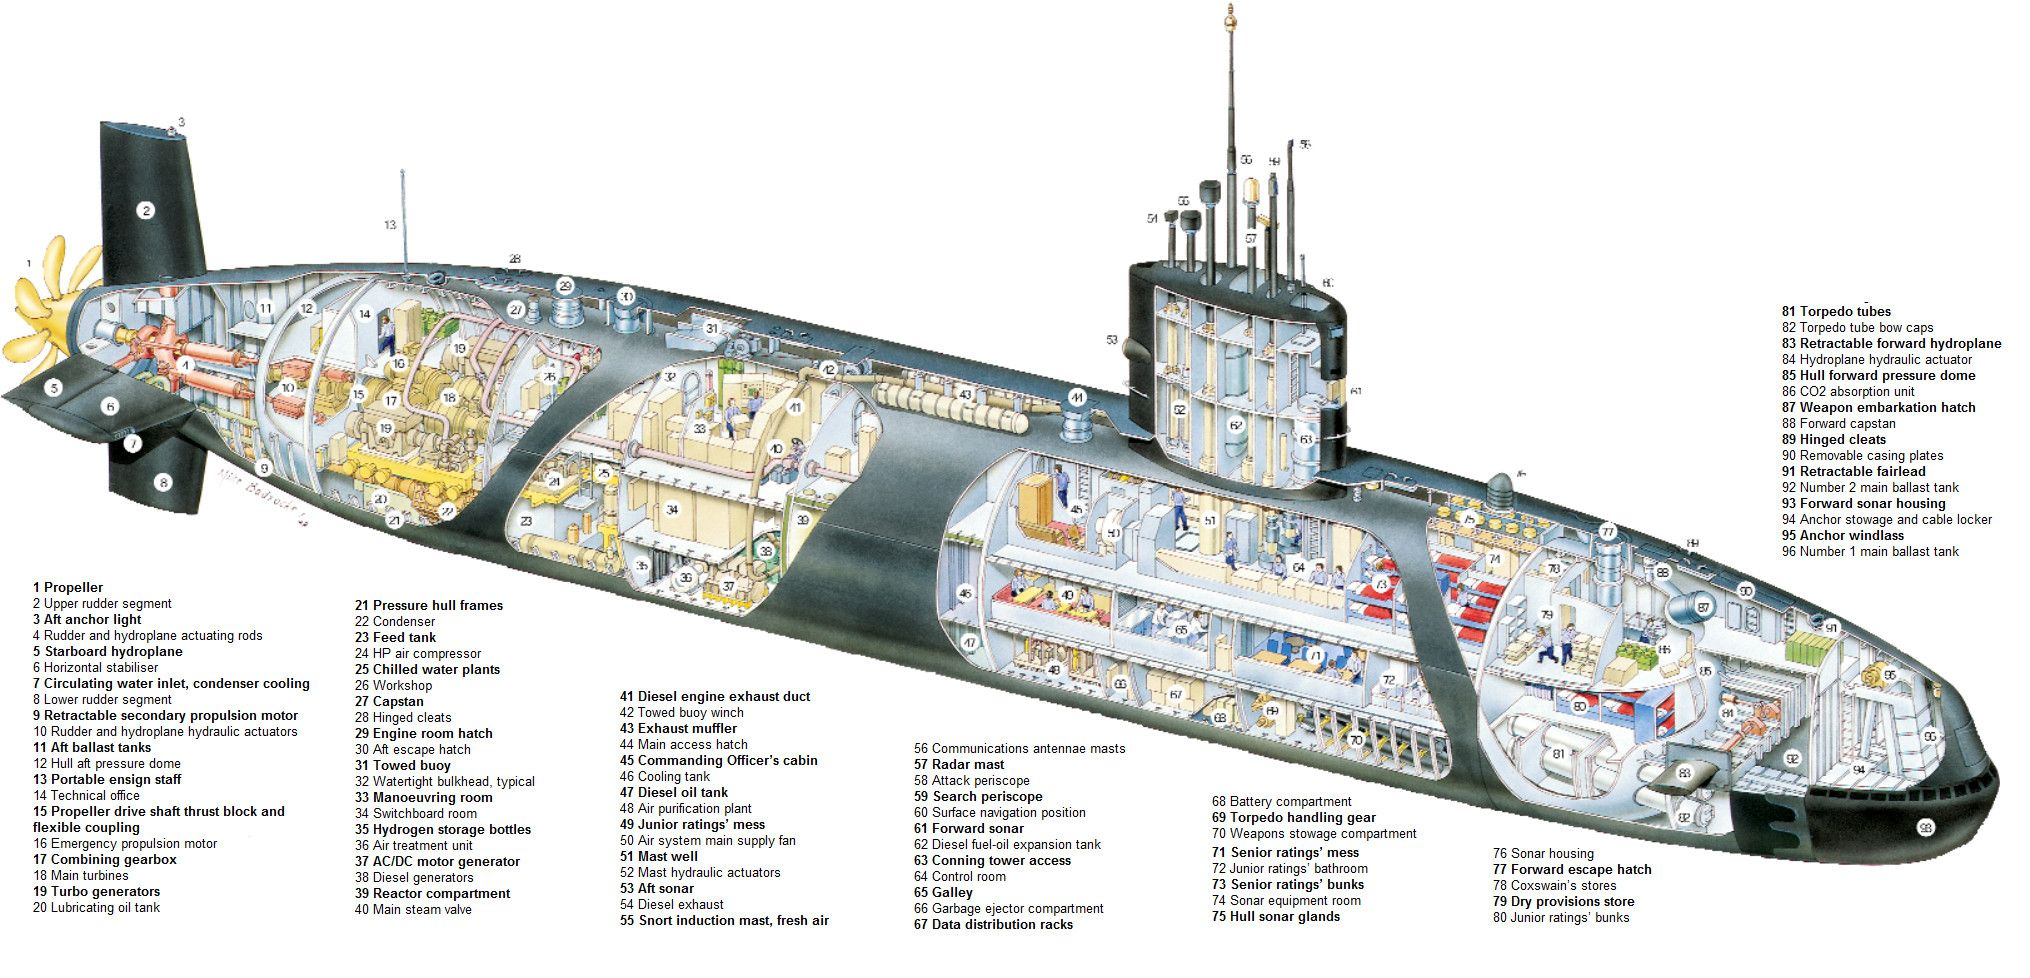 trafalgar class submarine cutaway [ 2030 x 978 Pixel ]